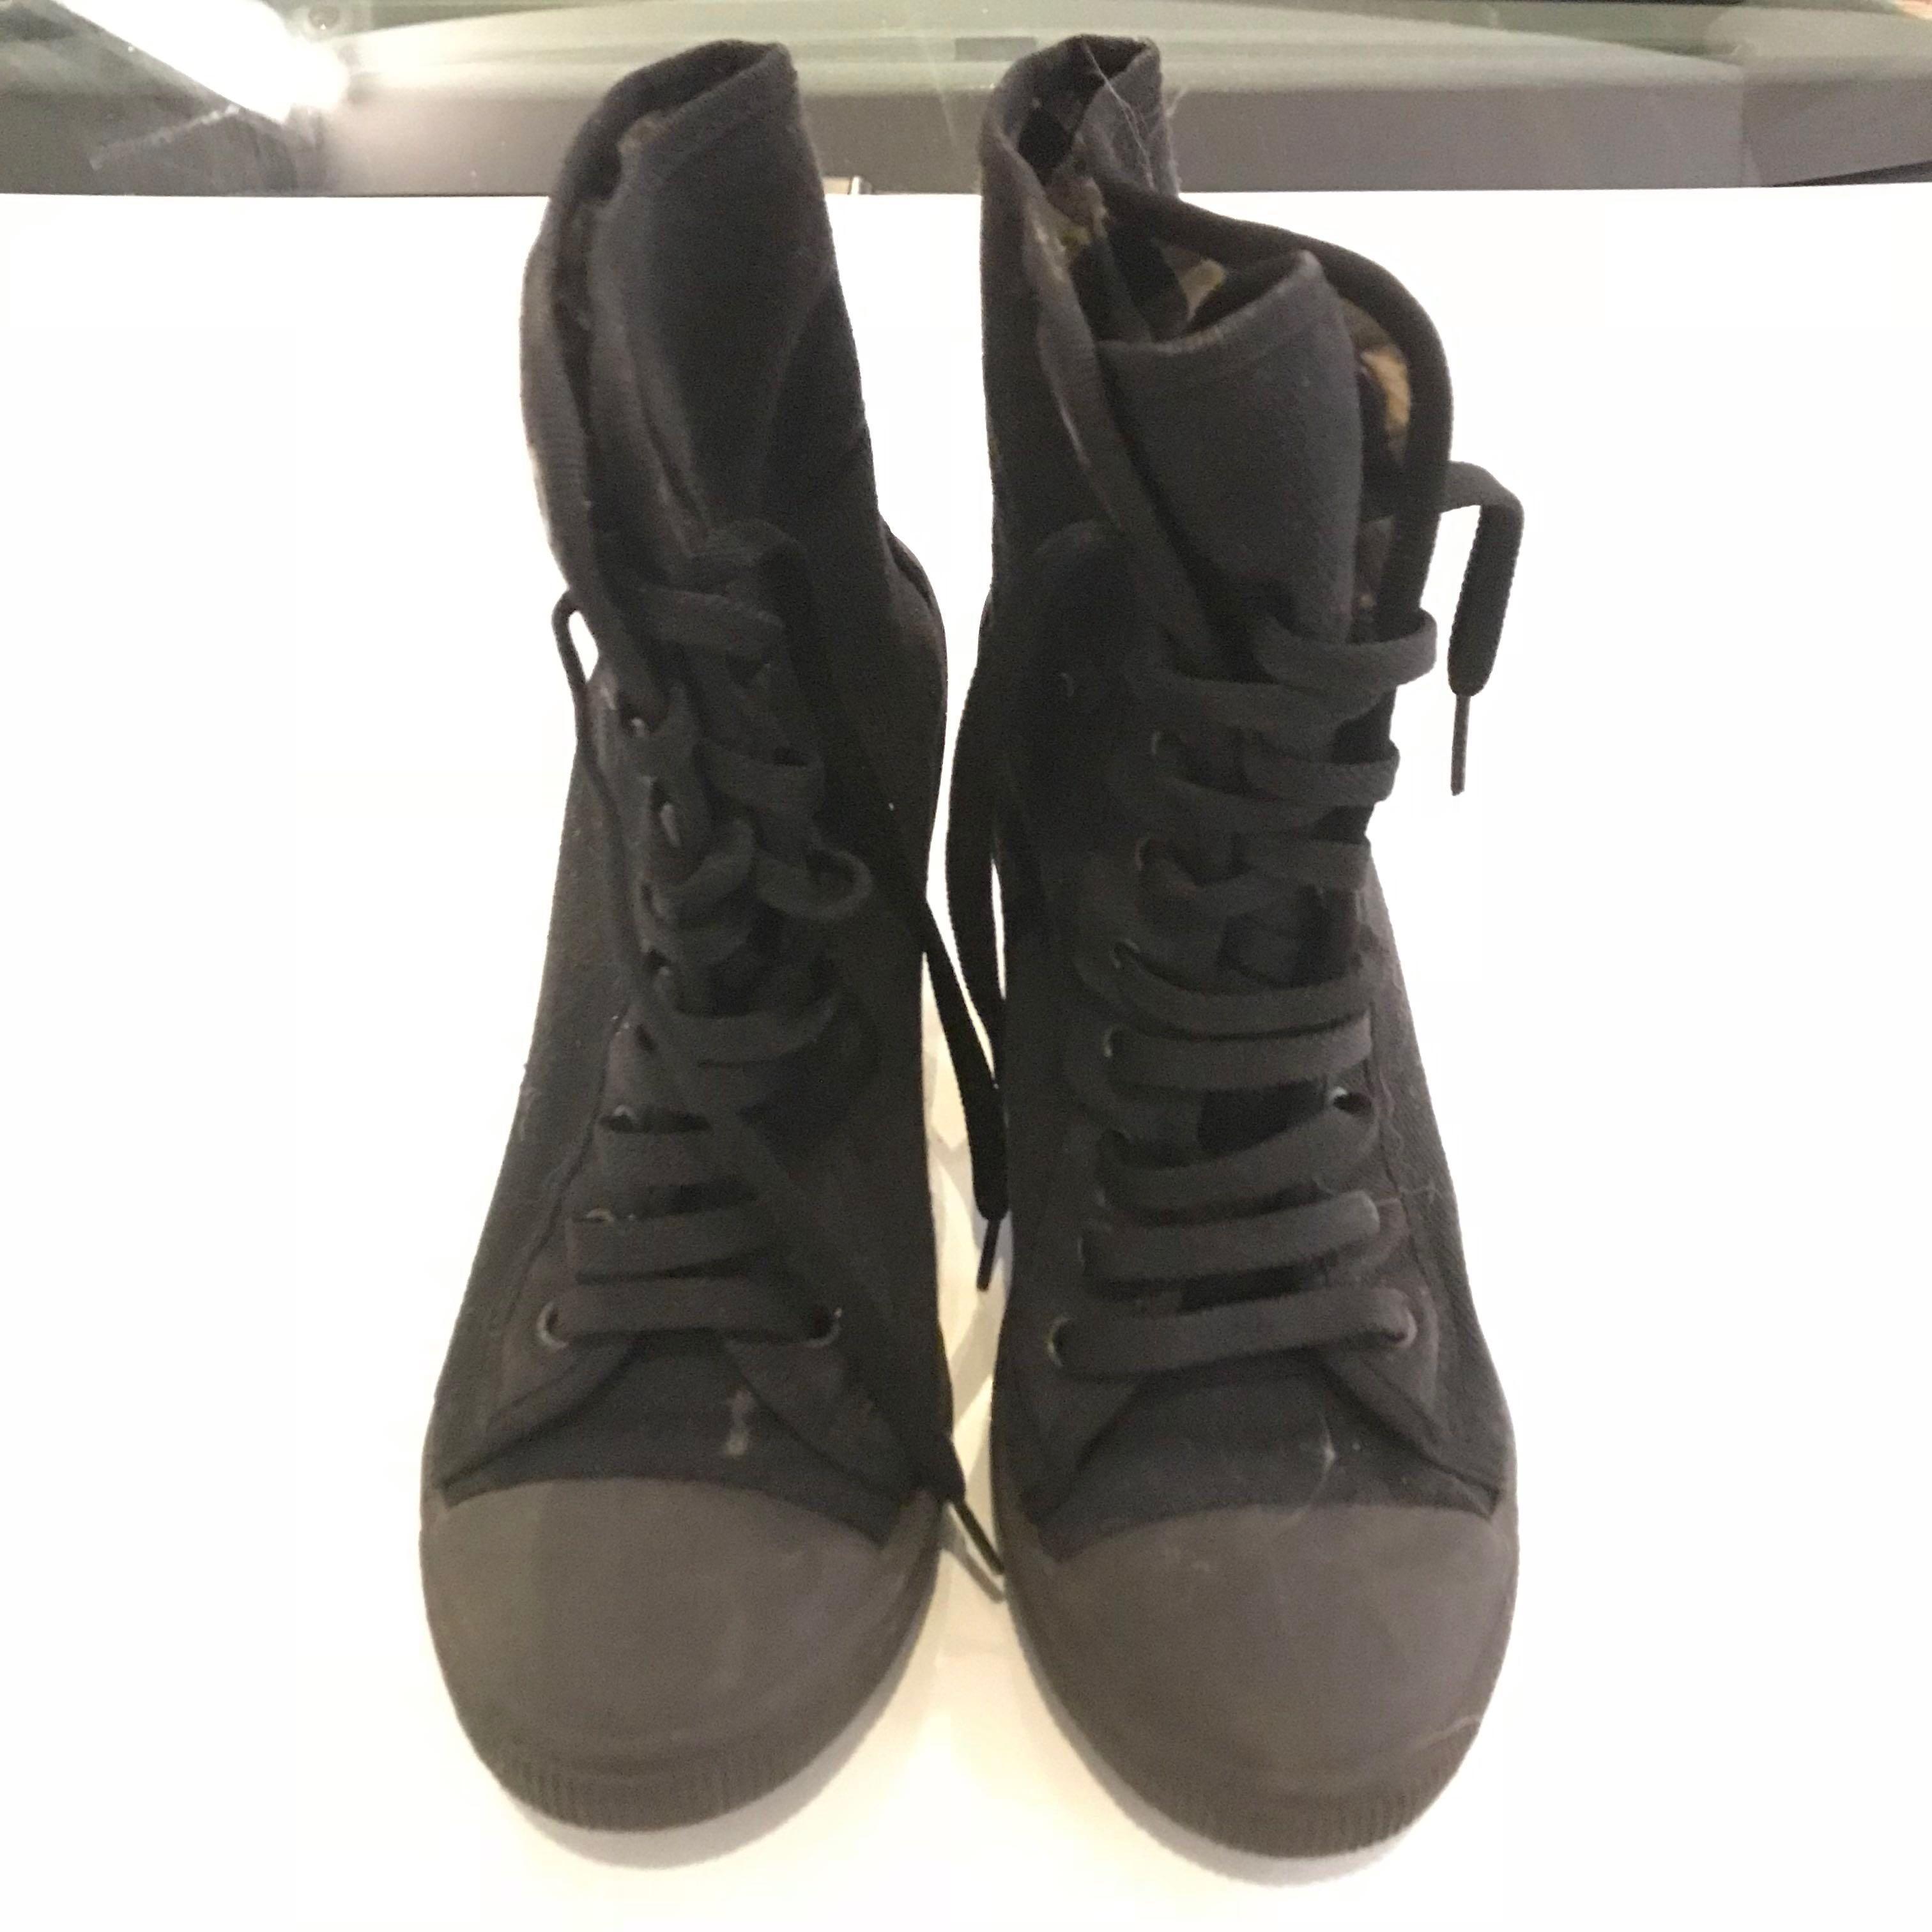 48df6d54 New Look Black Sneakers Wedges Heels, Women's Fashion, Shoes ...